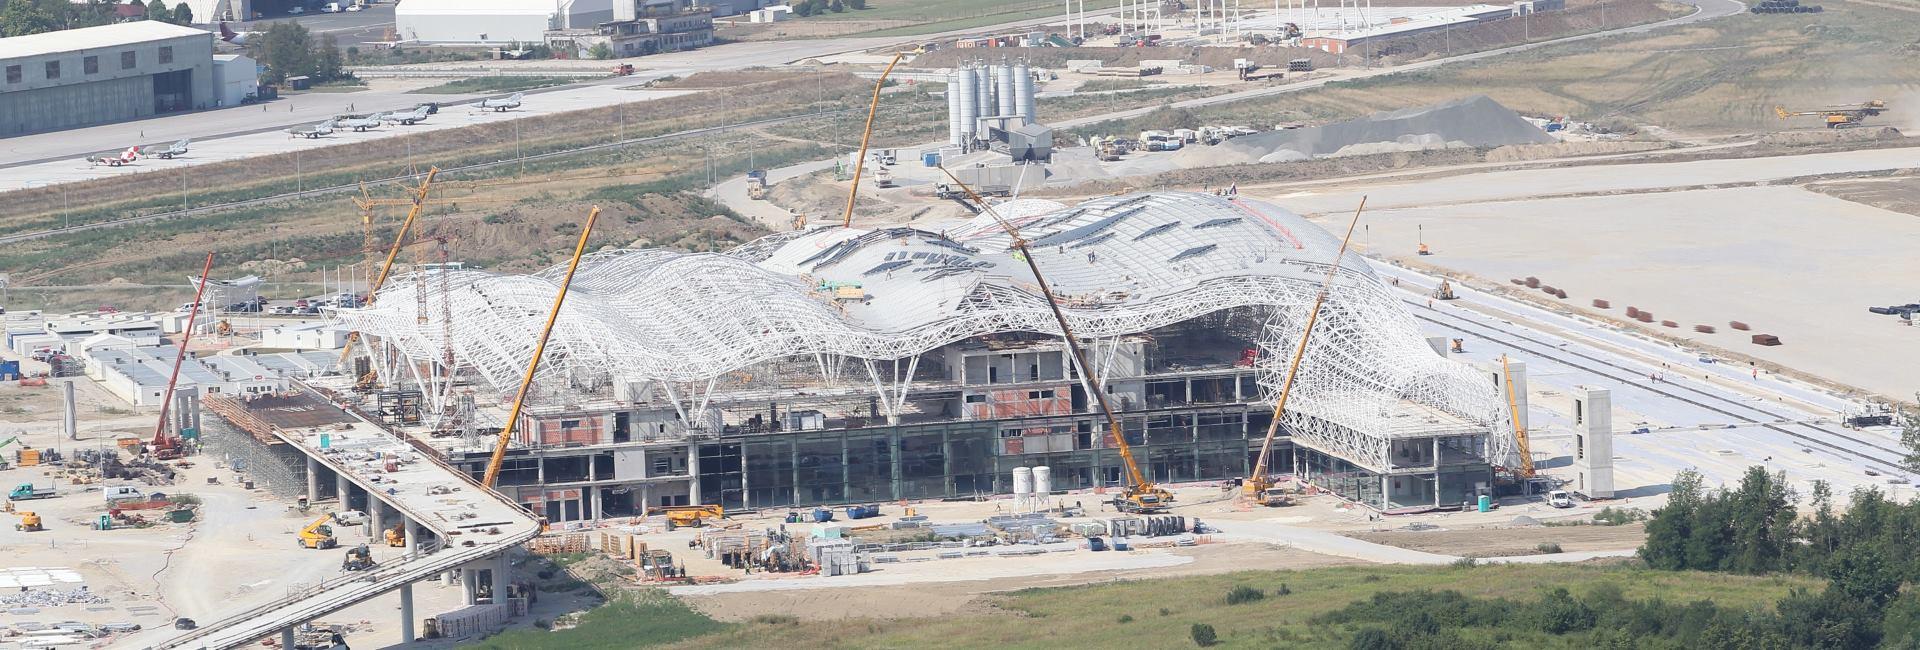 FOTO: Pogledajte kako napreduje gradnja Međunarodne zračne luke Zagreb